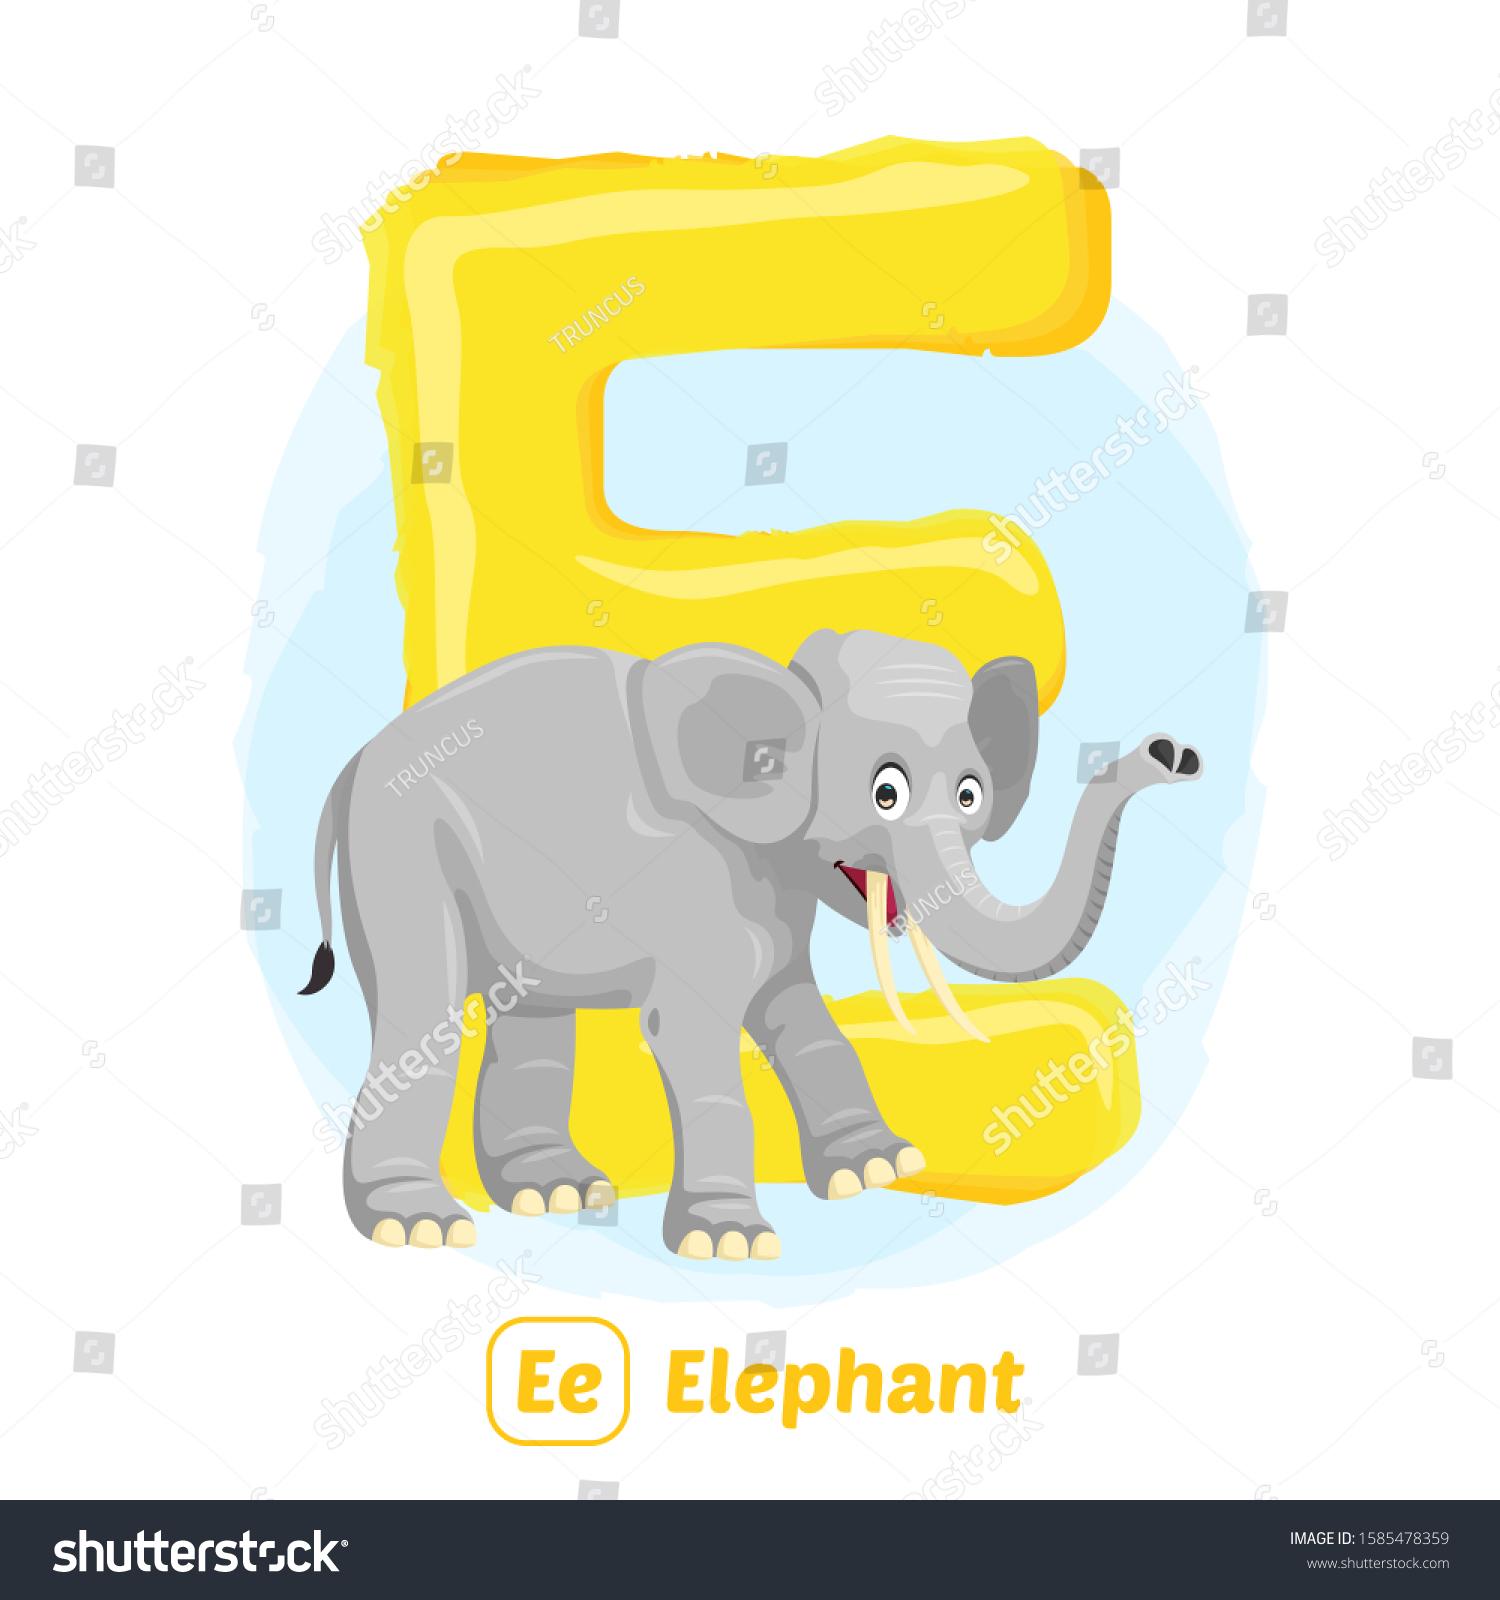 Stock Vector E Elephant Alphabet Animal Stock Vector Royalty Free 1585478359